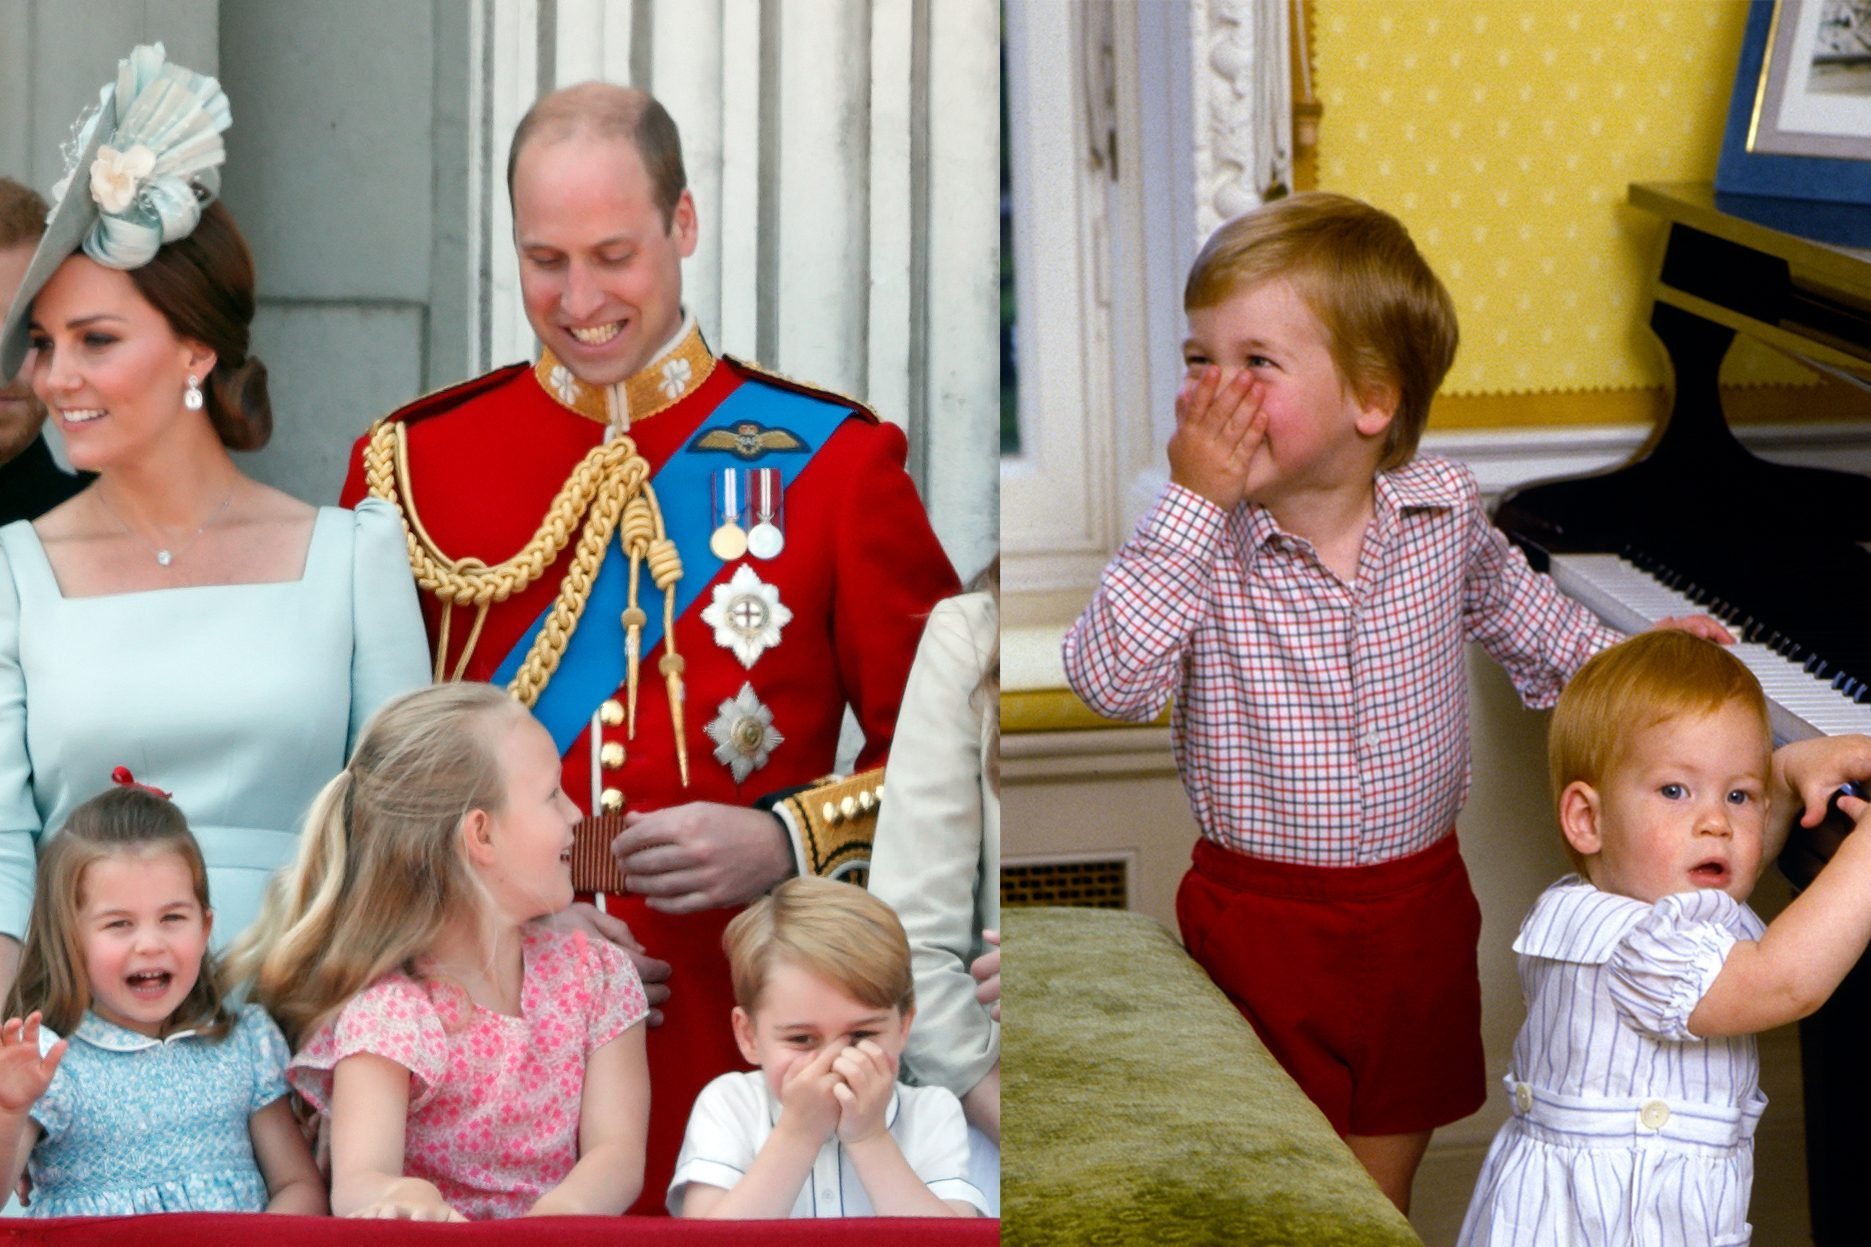 laughing royal family